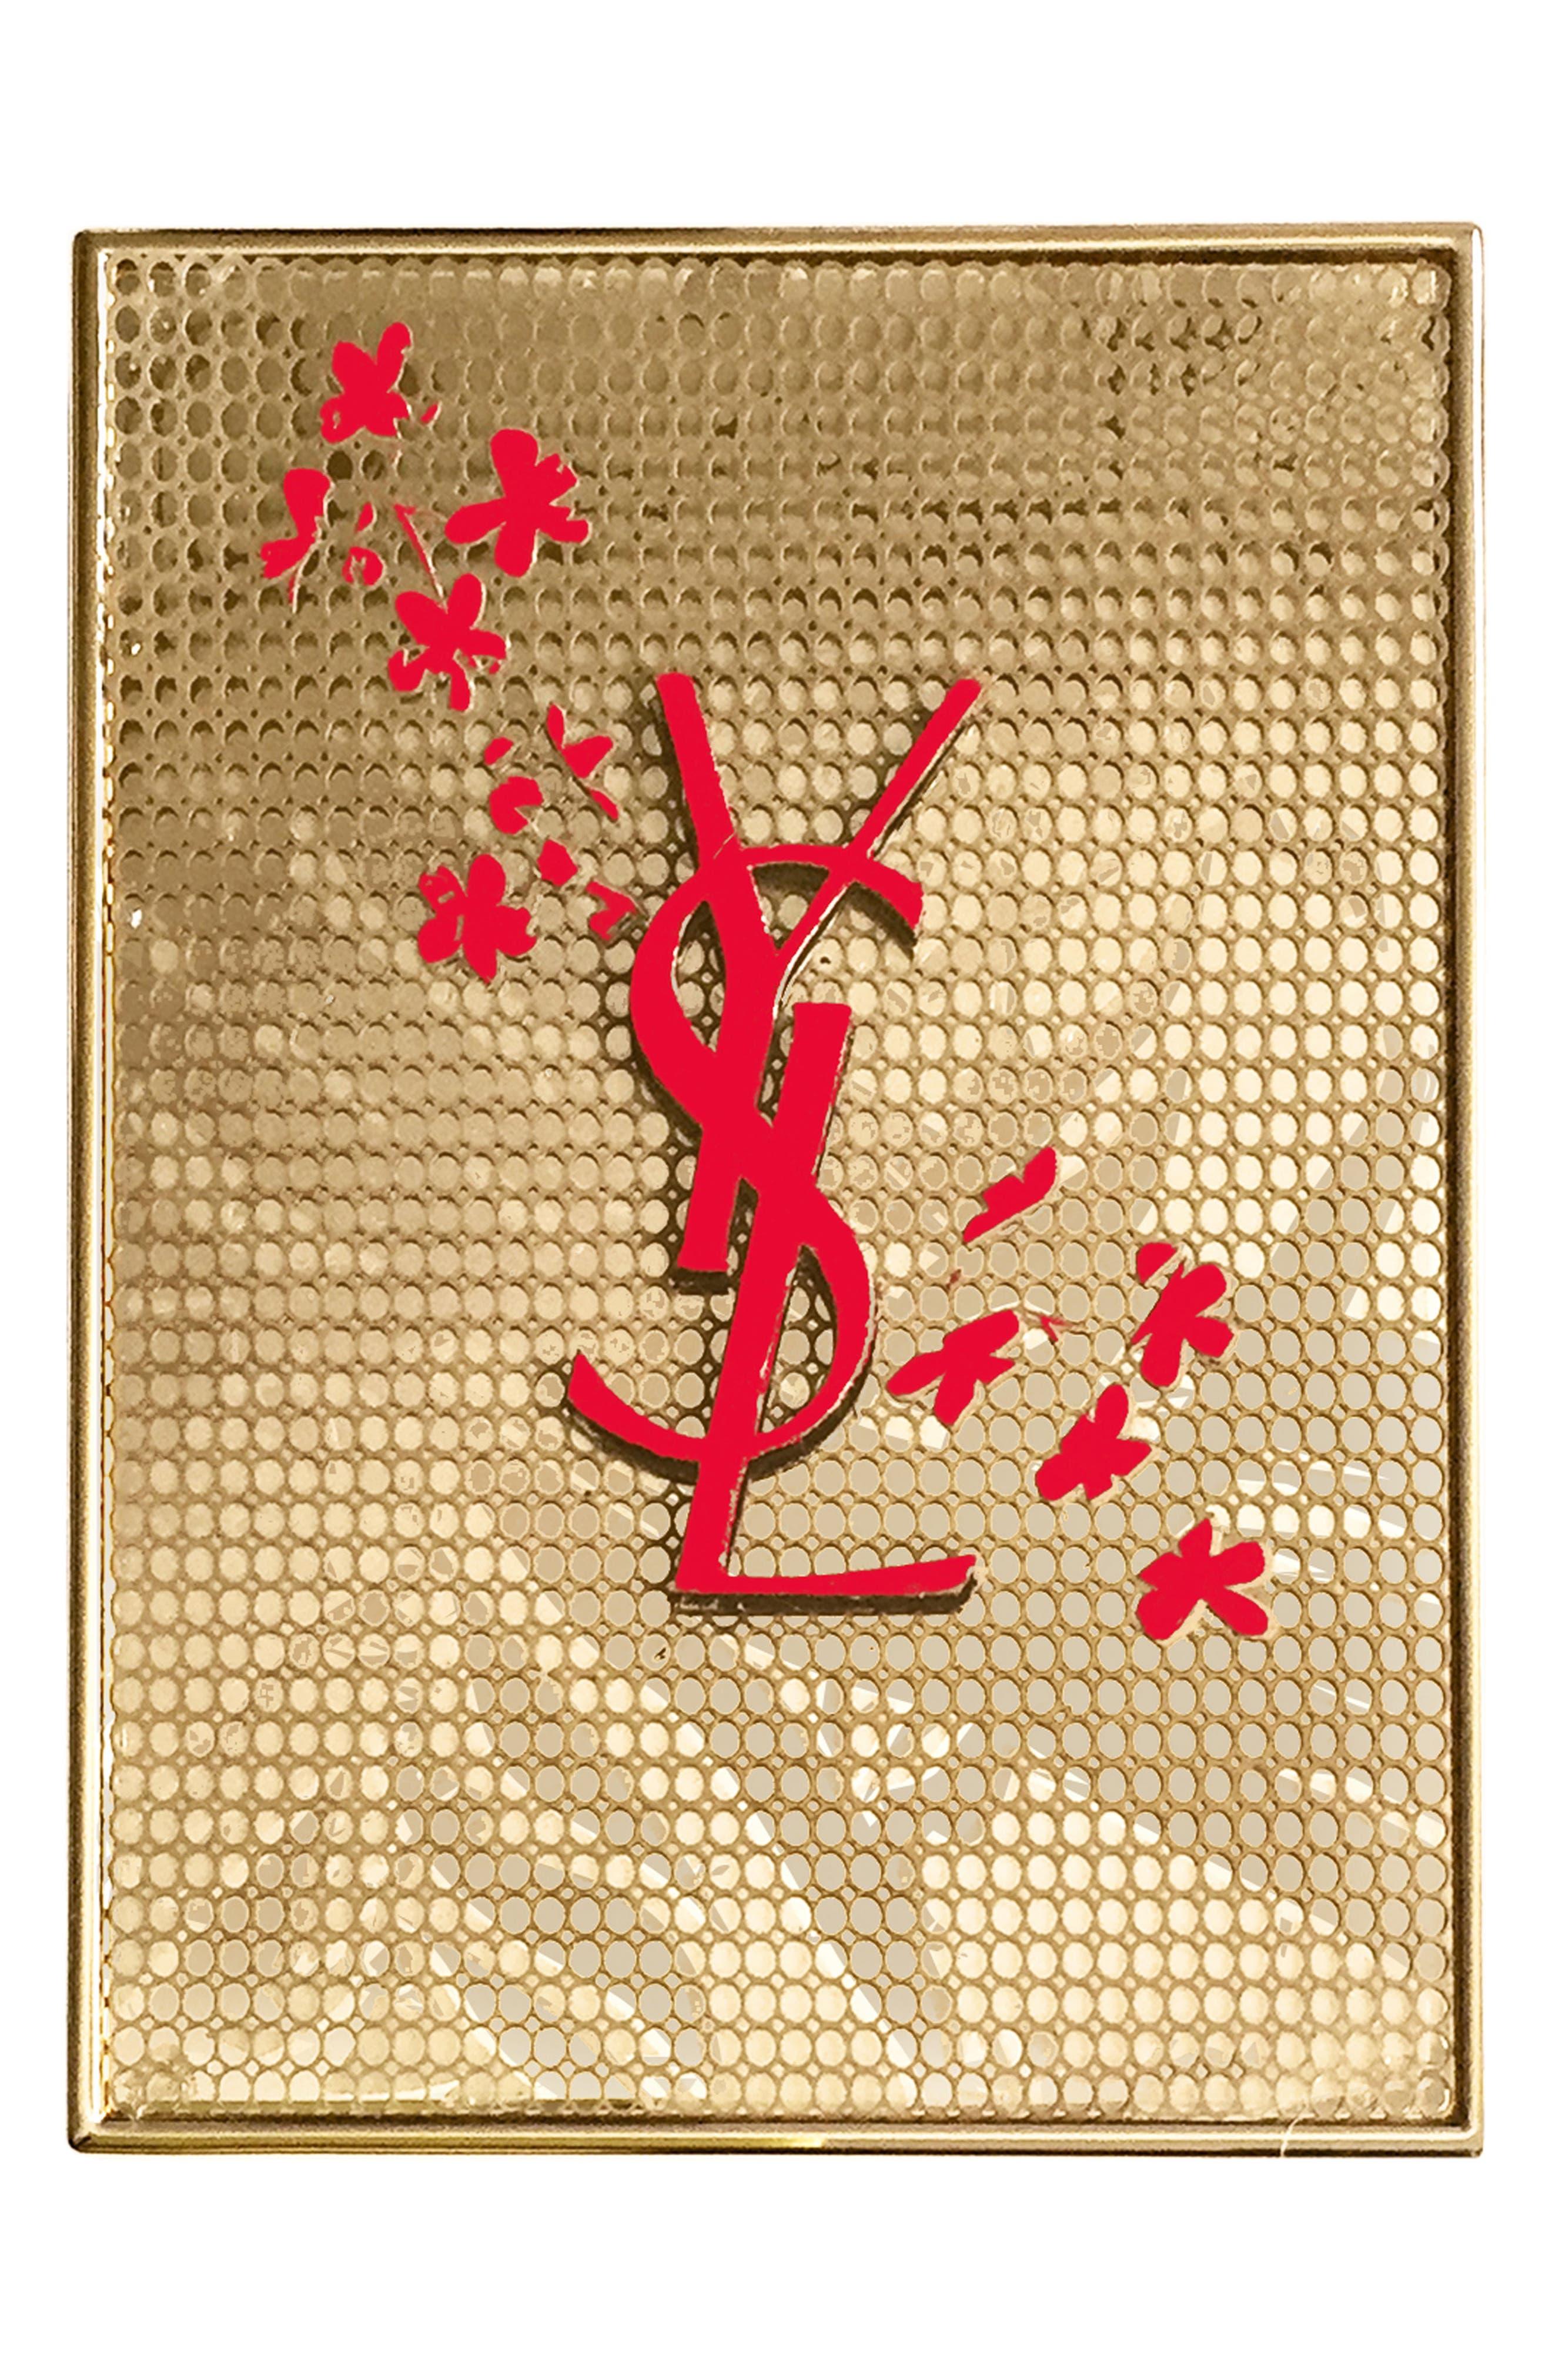 Chinese New Year Hope & Joy Blush Volupté Palette,                             Alternate thumbnail 2, color,                             No Color